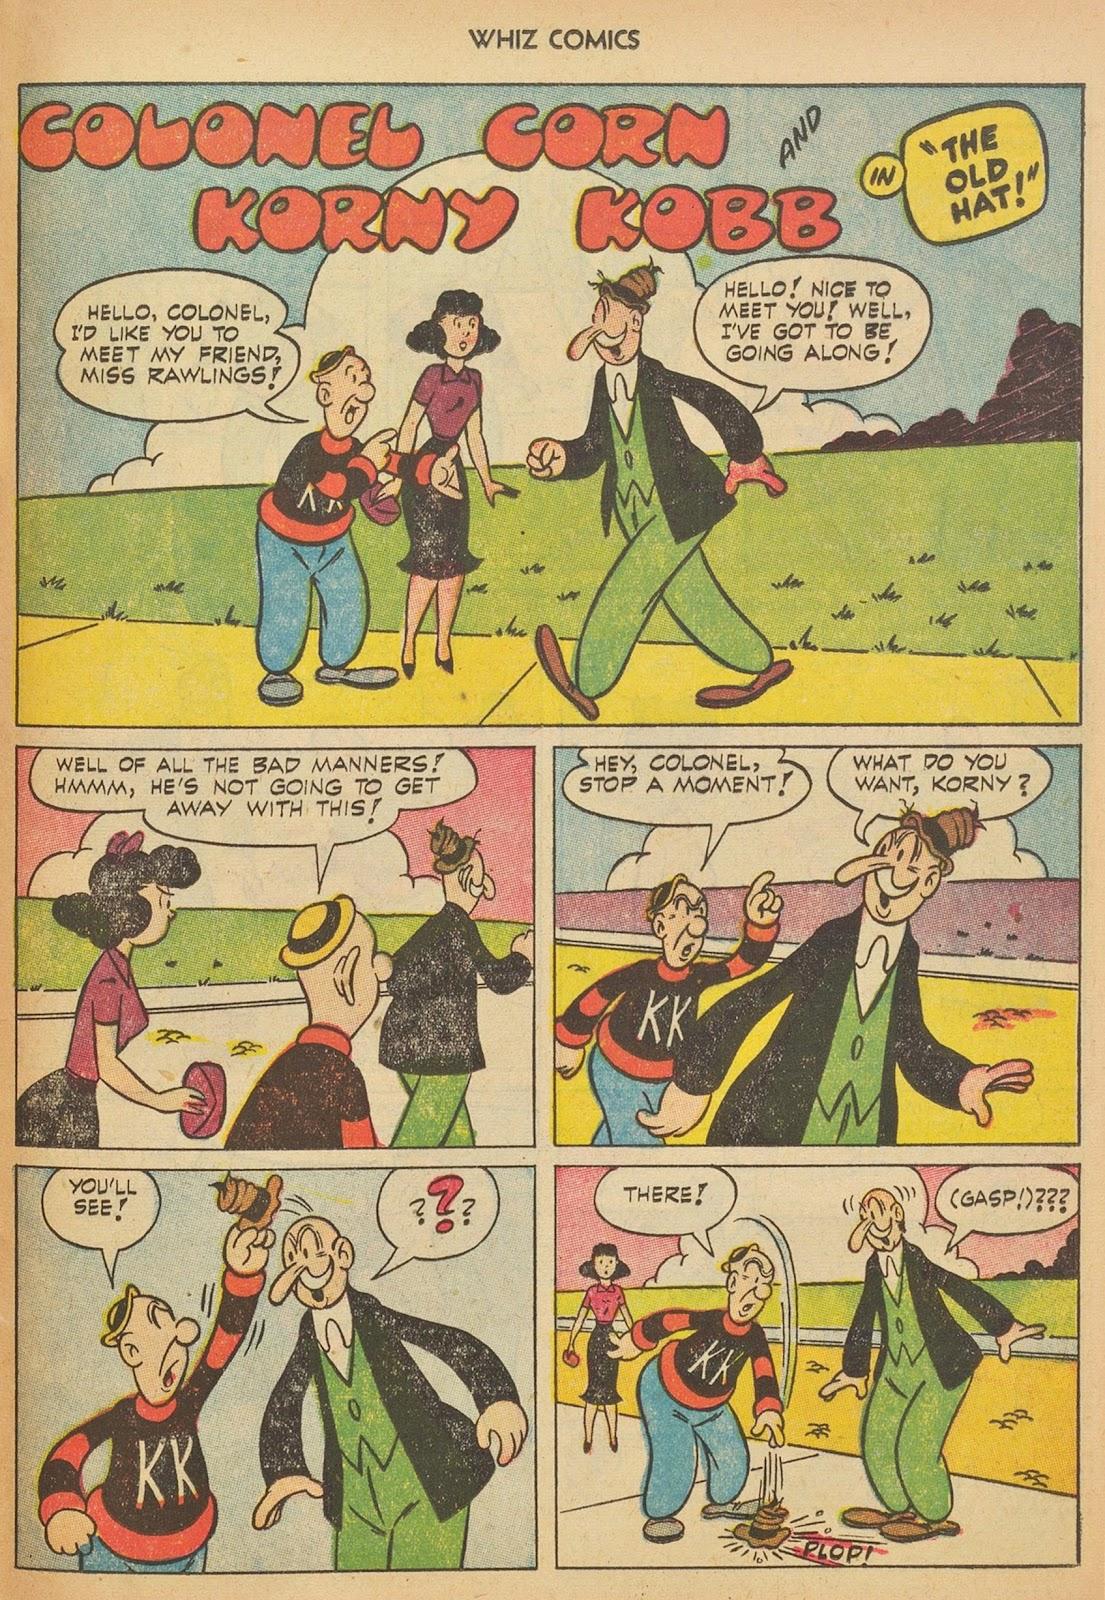 Read online WHIZ Comics comic -  Issue #153 - 25